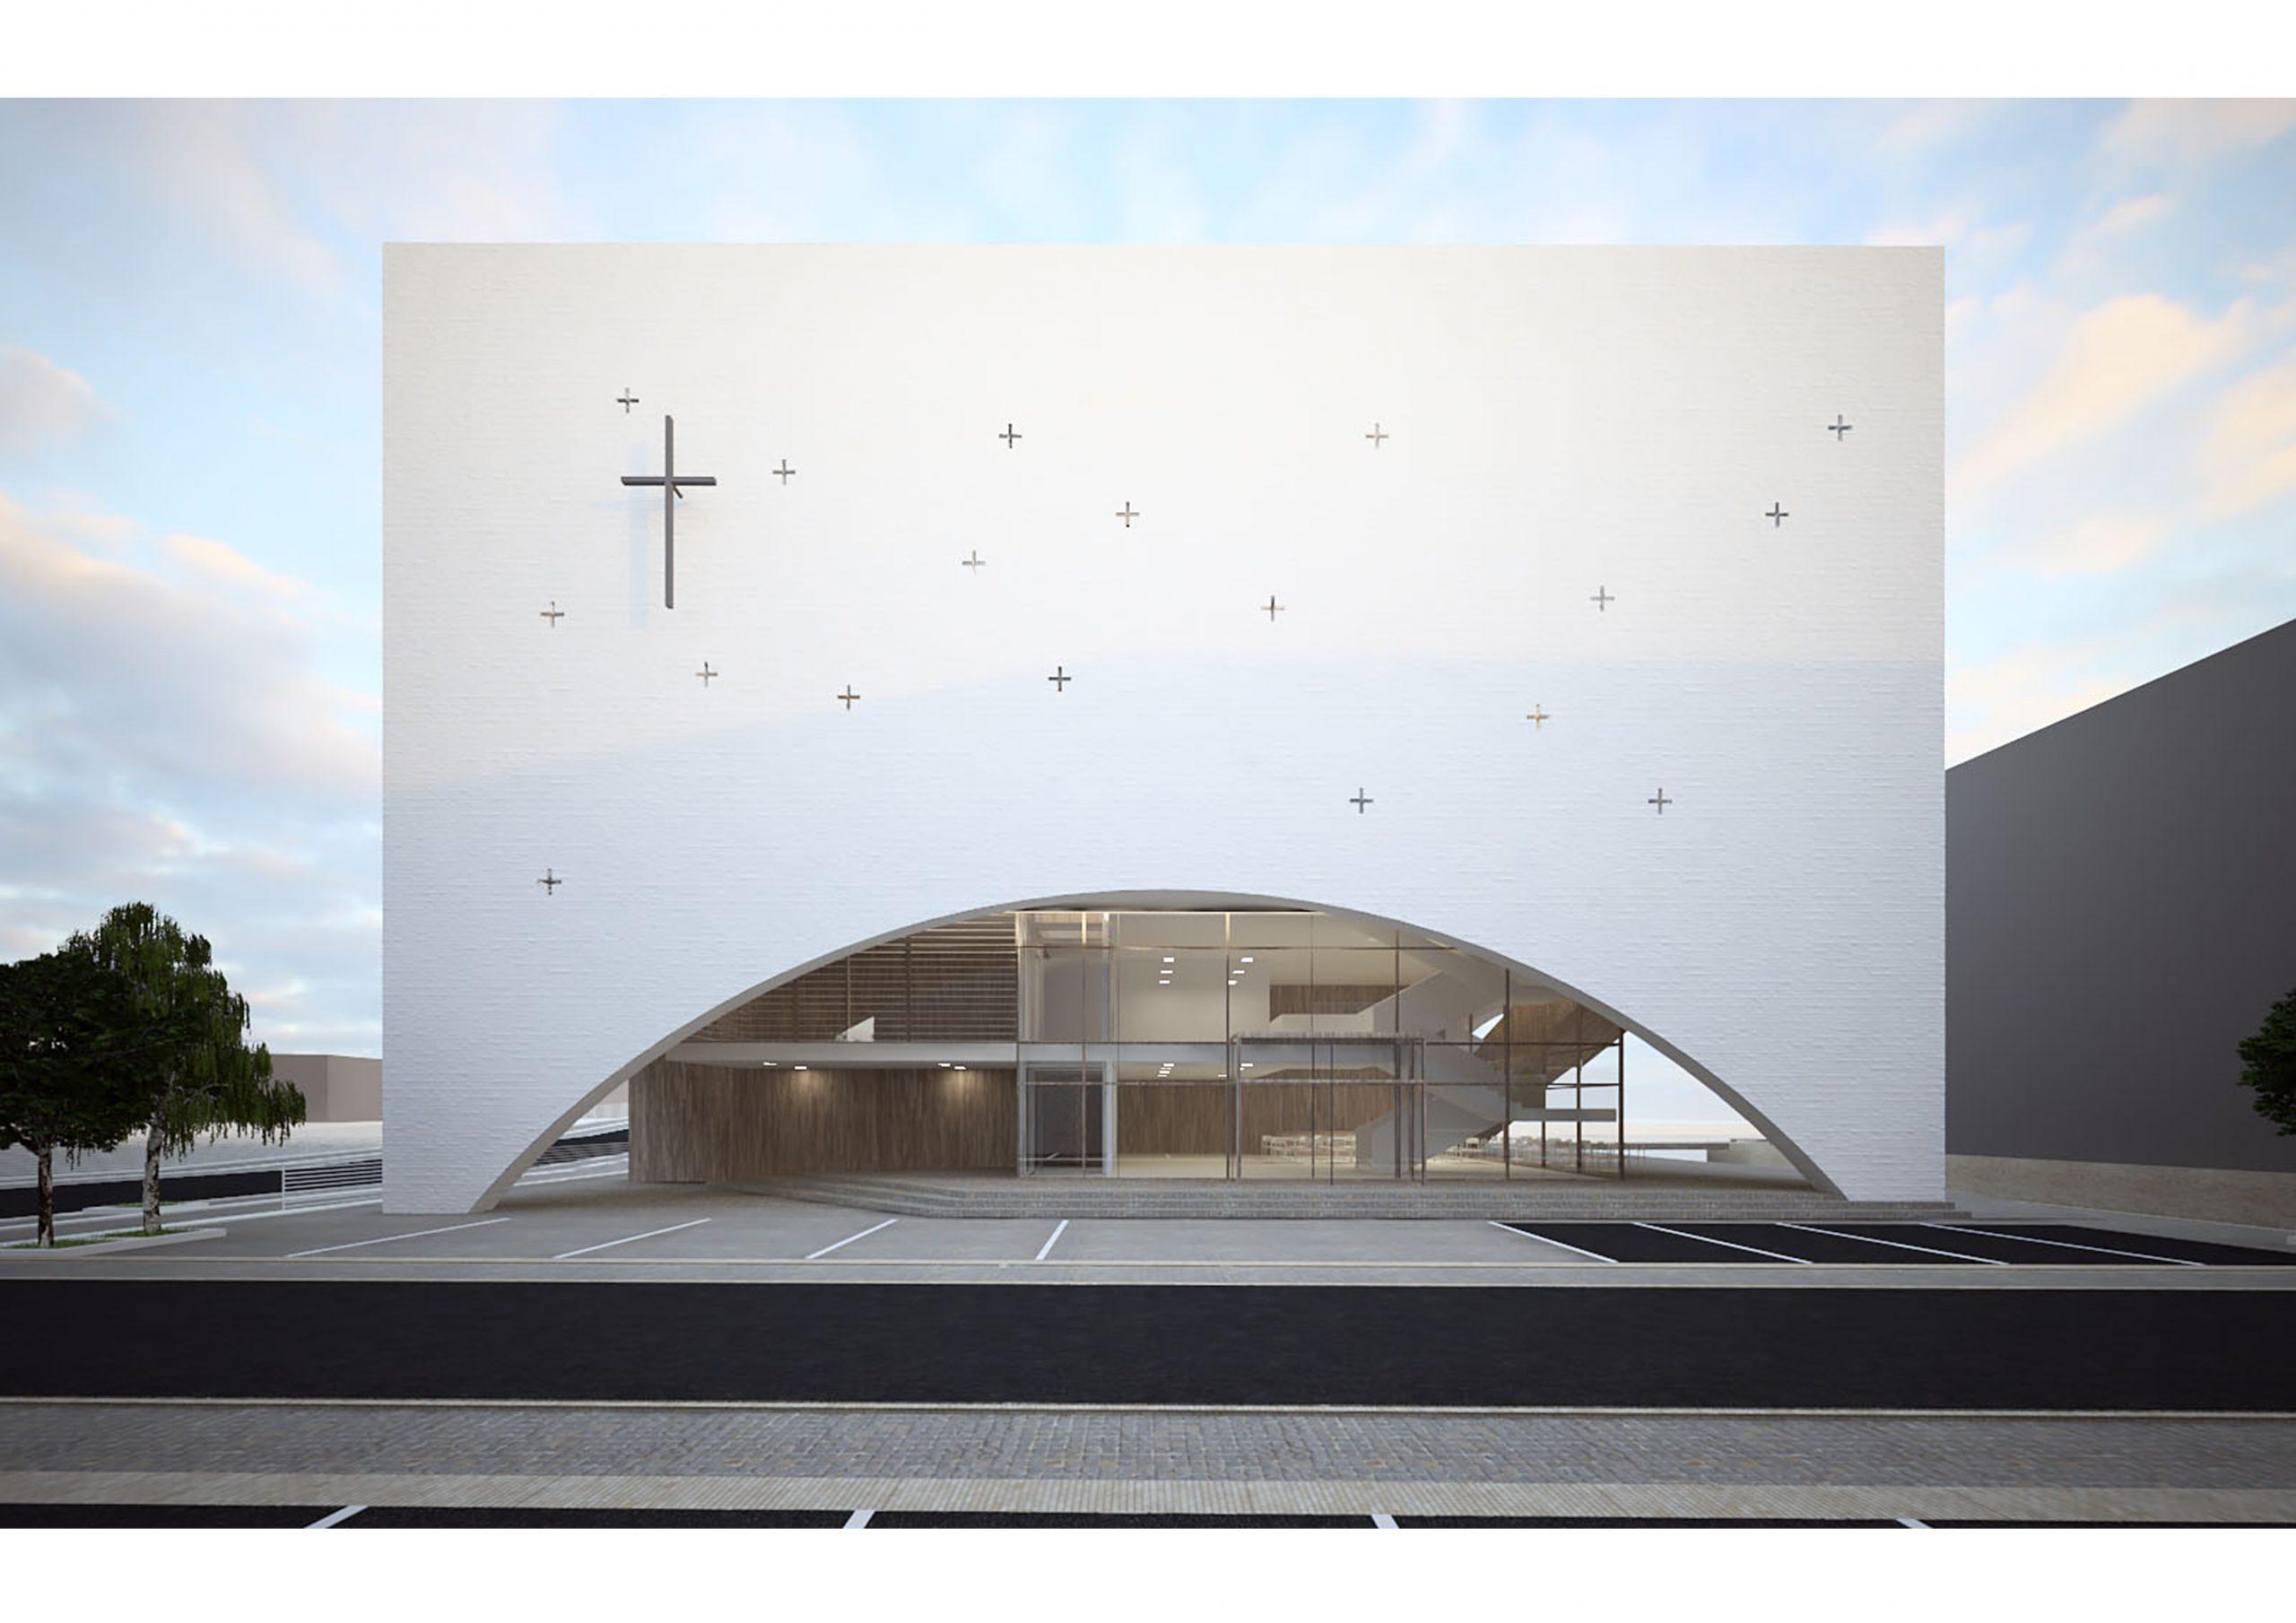 https://nbc-arhitect.ro/wp-content/uploads/2020/10/NBC-Arhitect-_-public-buildings-_-Protestant-Church-_-Copenhagen-_-exterior-view_1-scaled.jpg